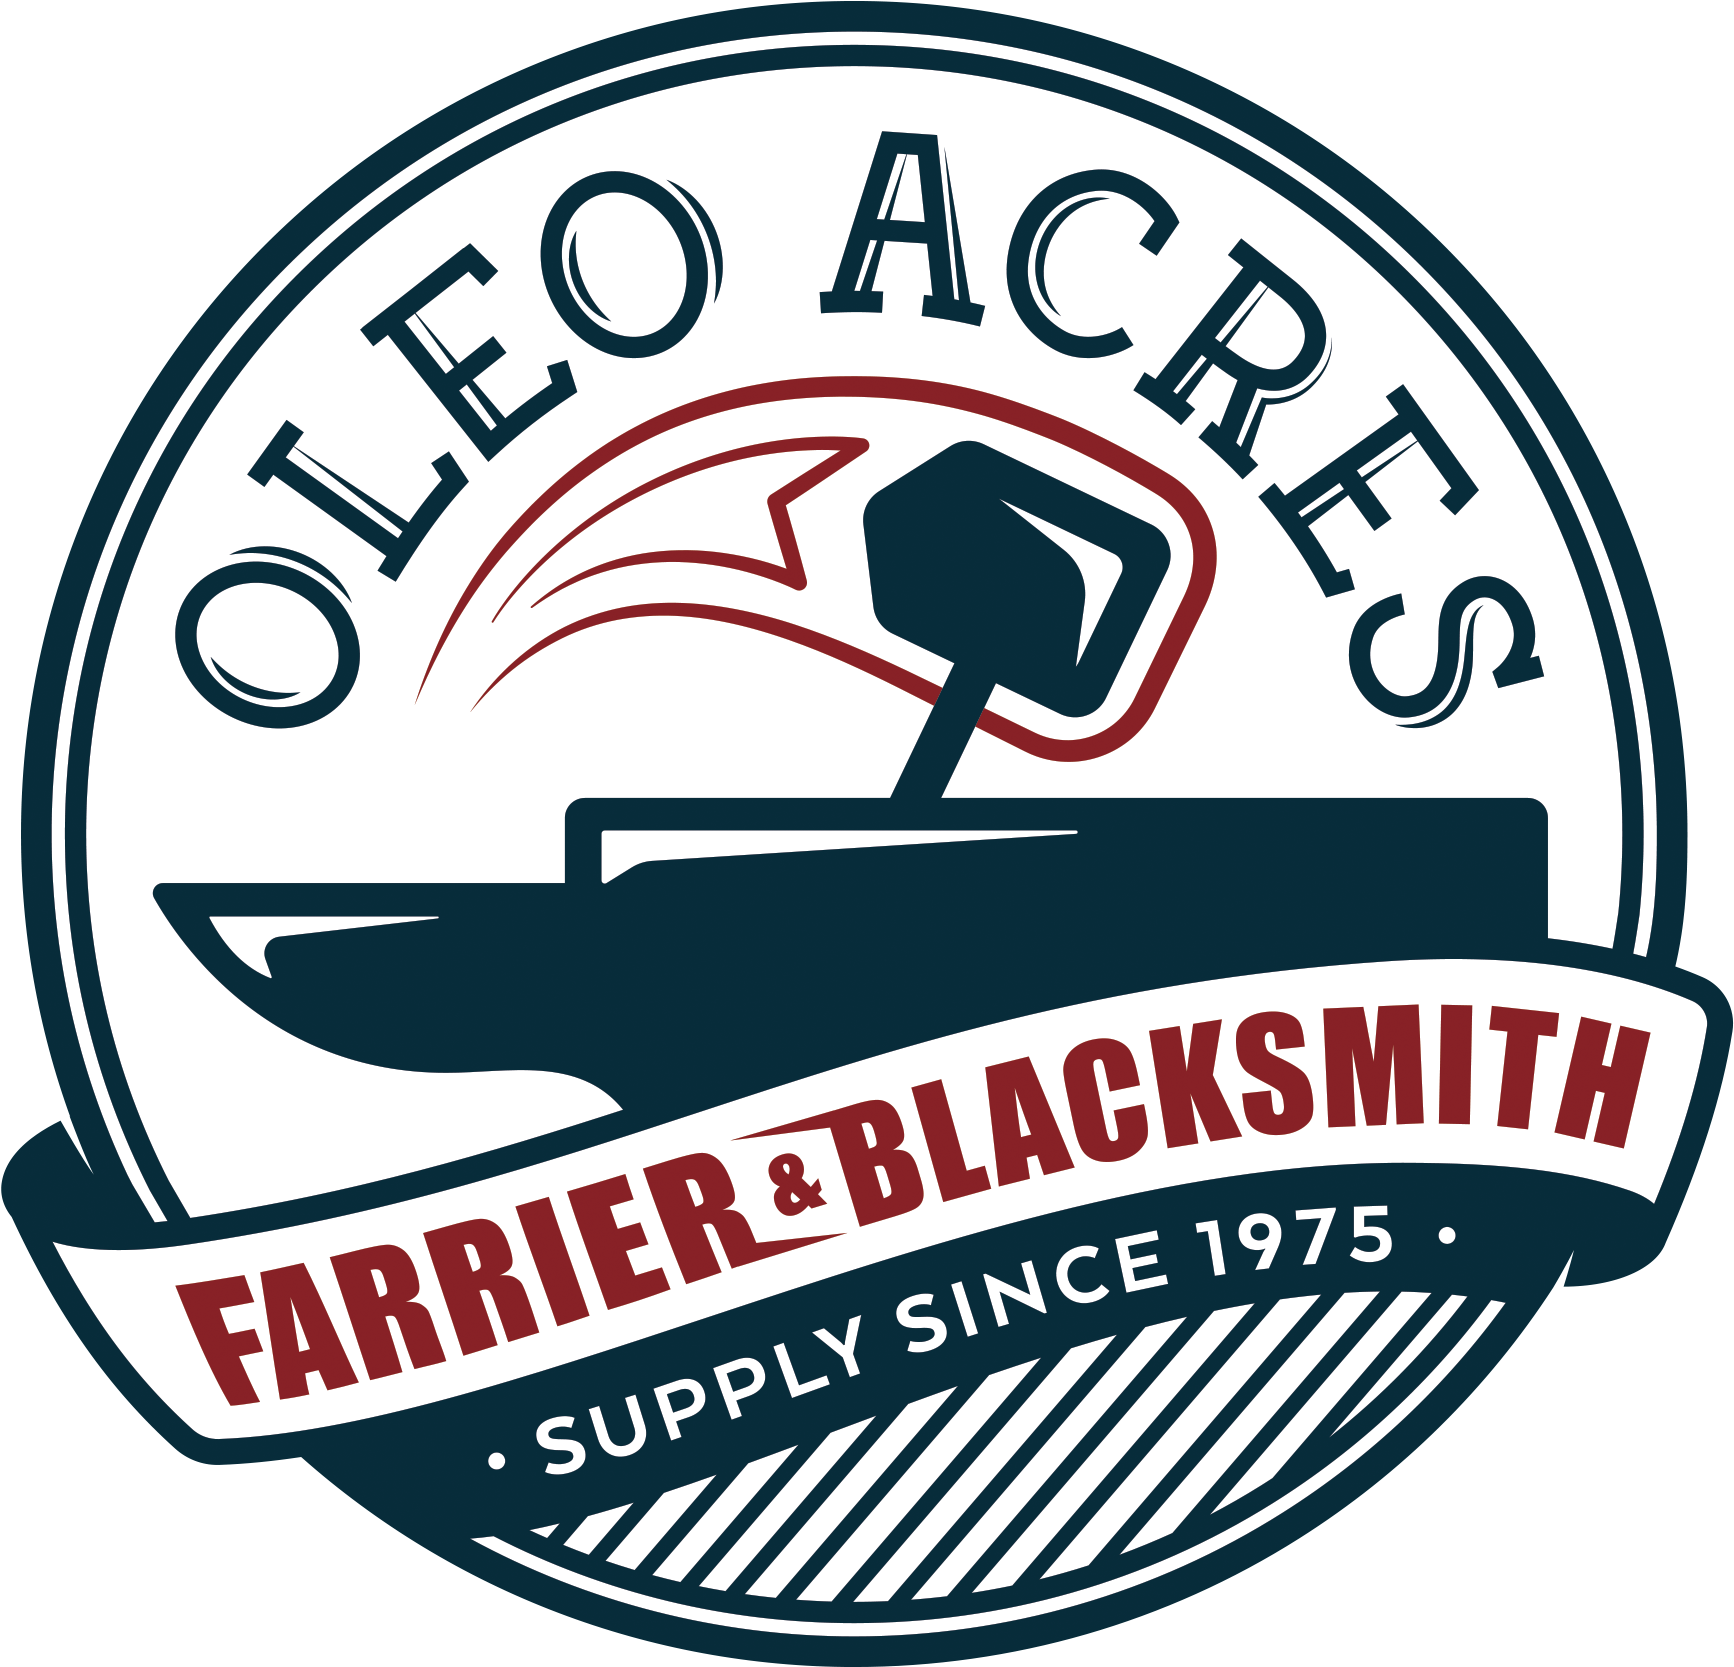 Oleo Acres Farrier & Blacksmith Supply 1036 S County.